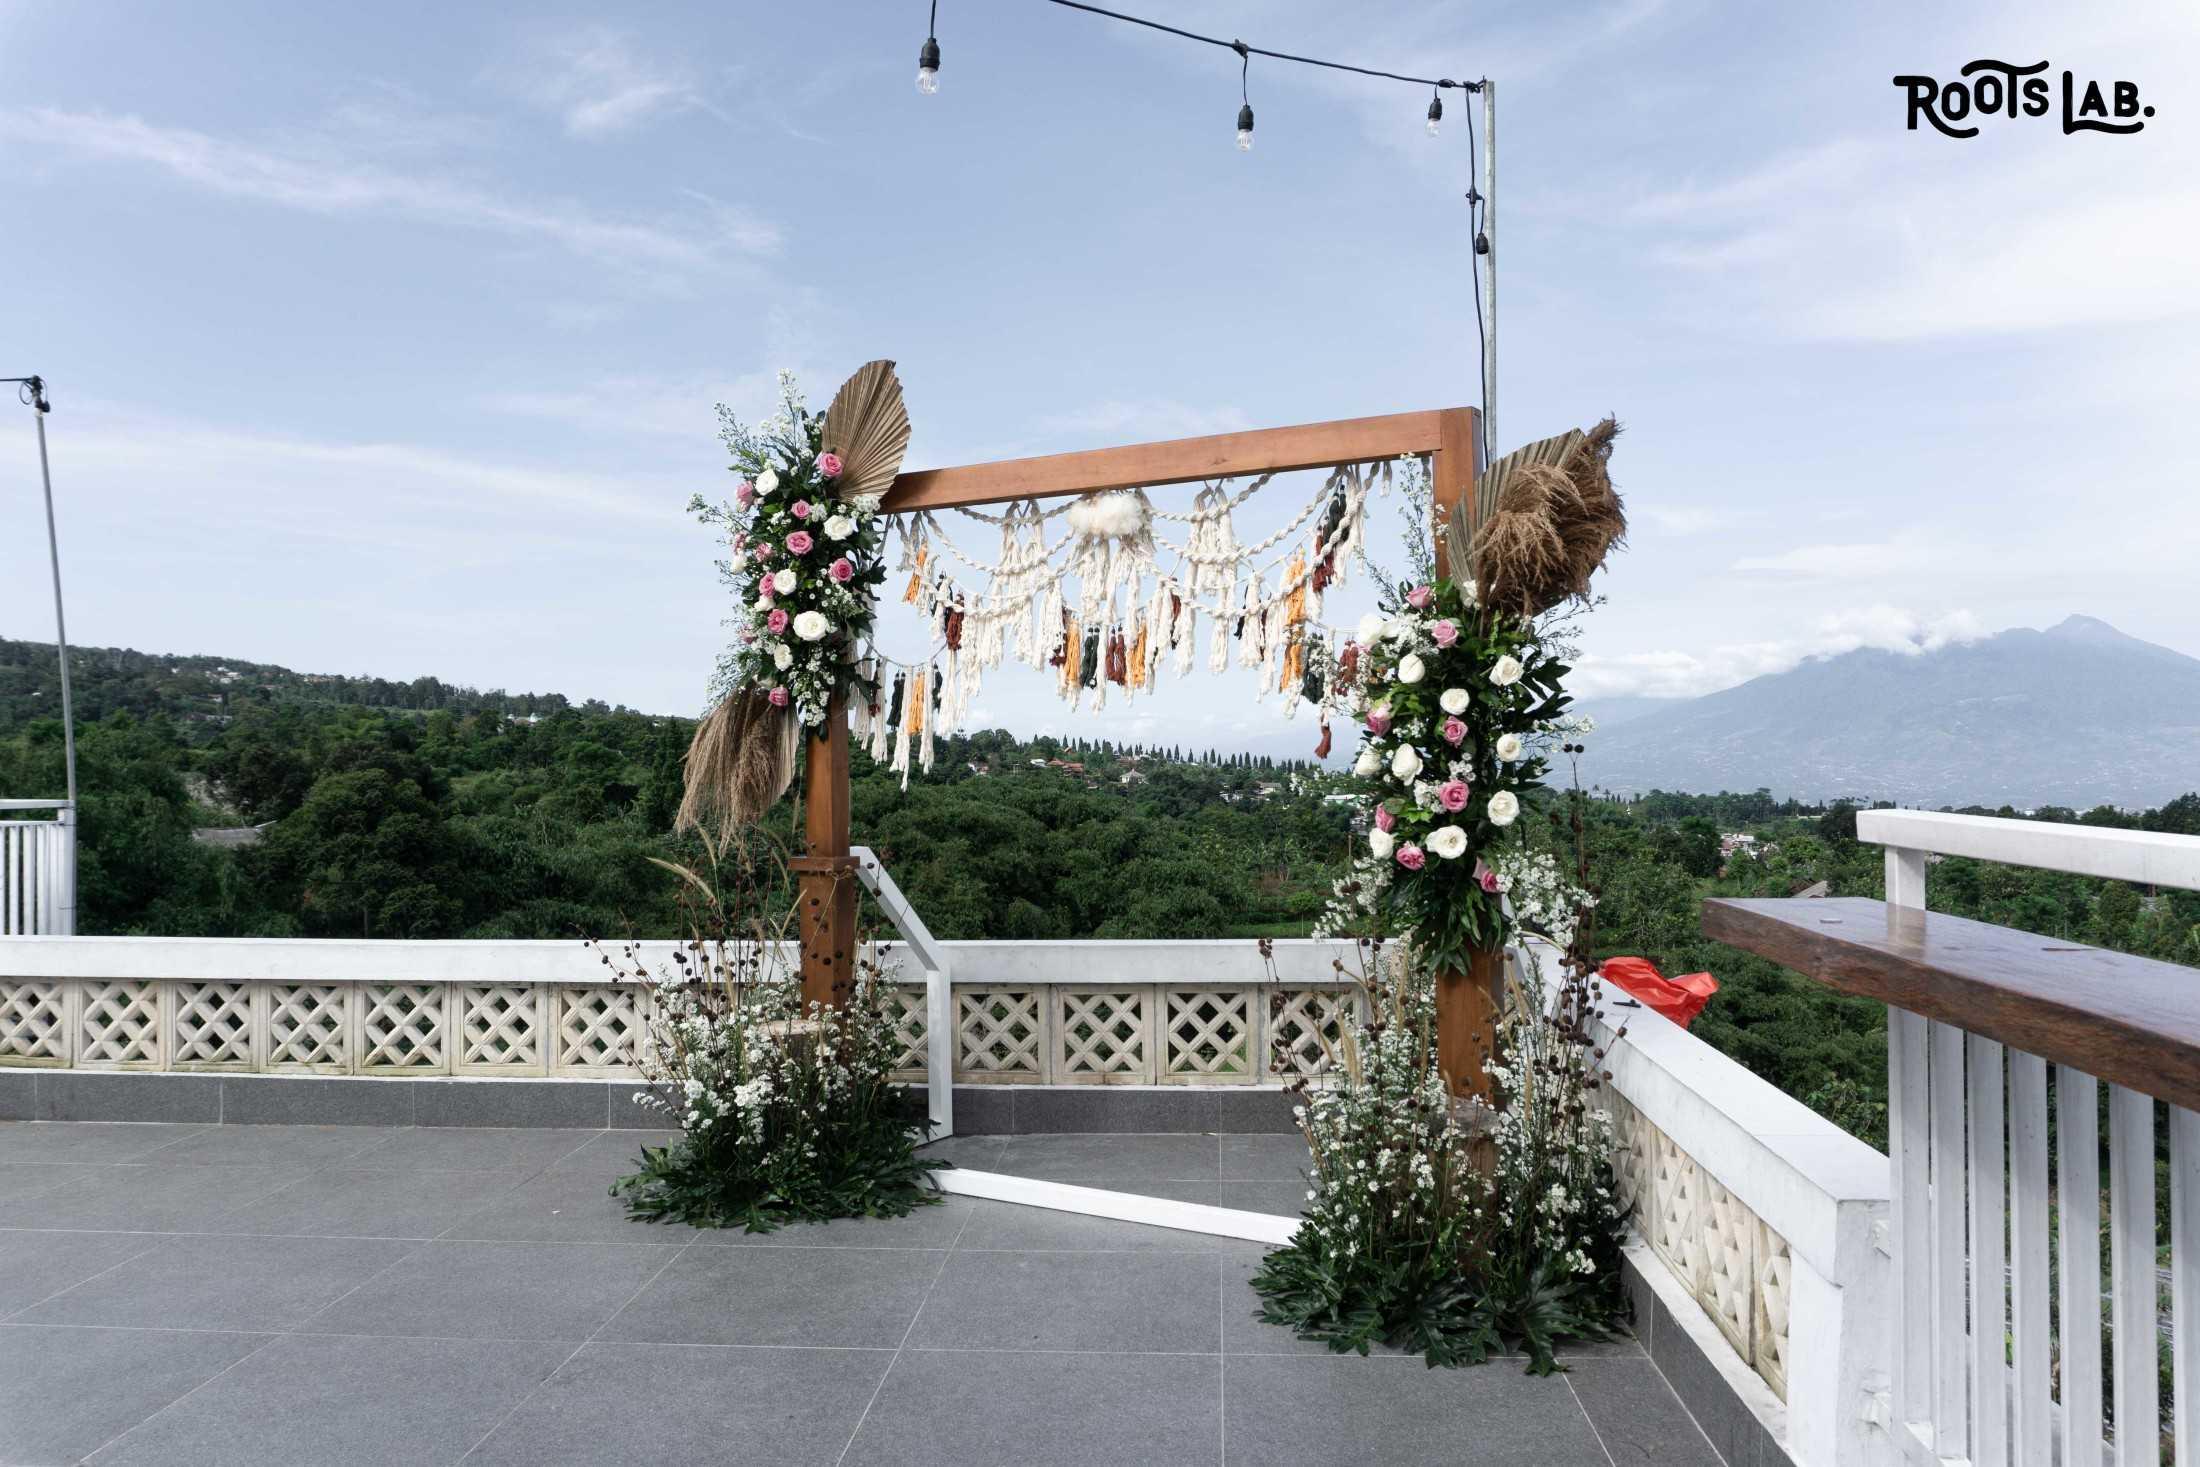 Rootslab Intimate Wedding Venue Villa Akira Megamendung, Kec. Megamendung, Bogor, Jawa Barat, Indonesia Megamendung, Kec. Megamendung, Bogor, Jawa Barat, Indonesia Rootslab-Intimate-Wedding-Venue-Villa-Akira  111418